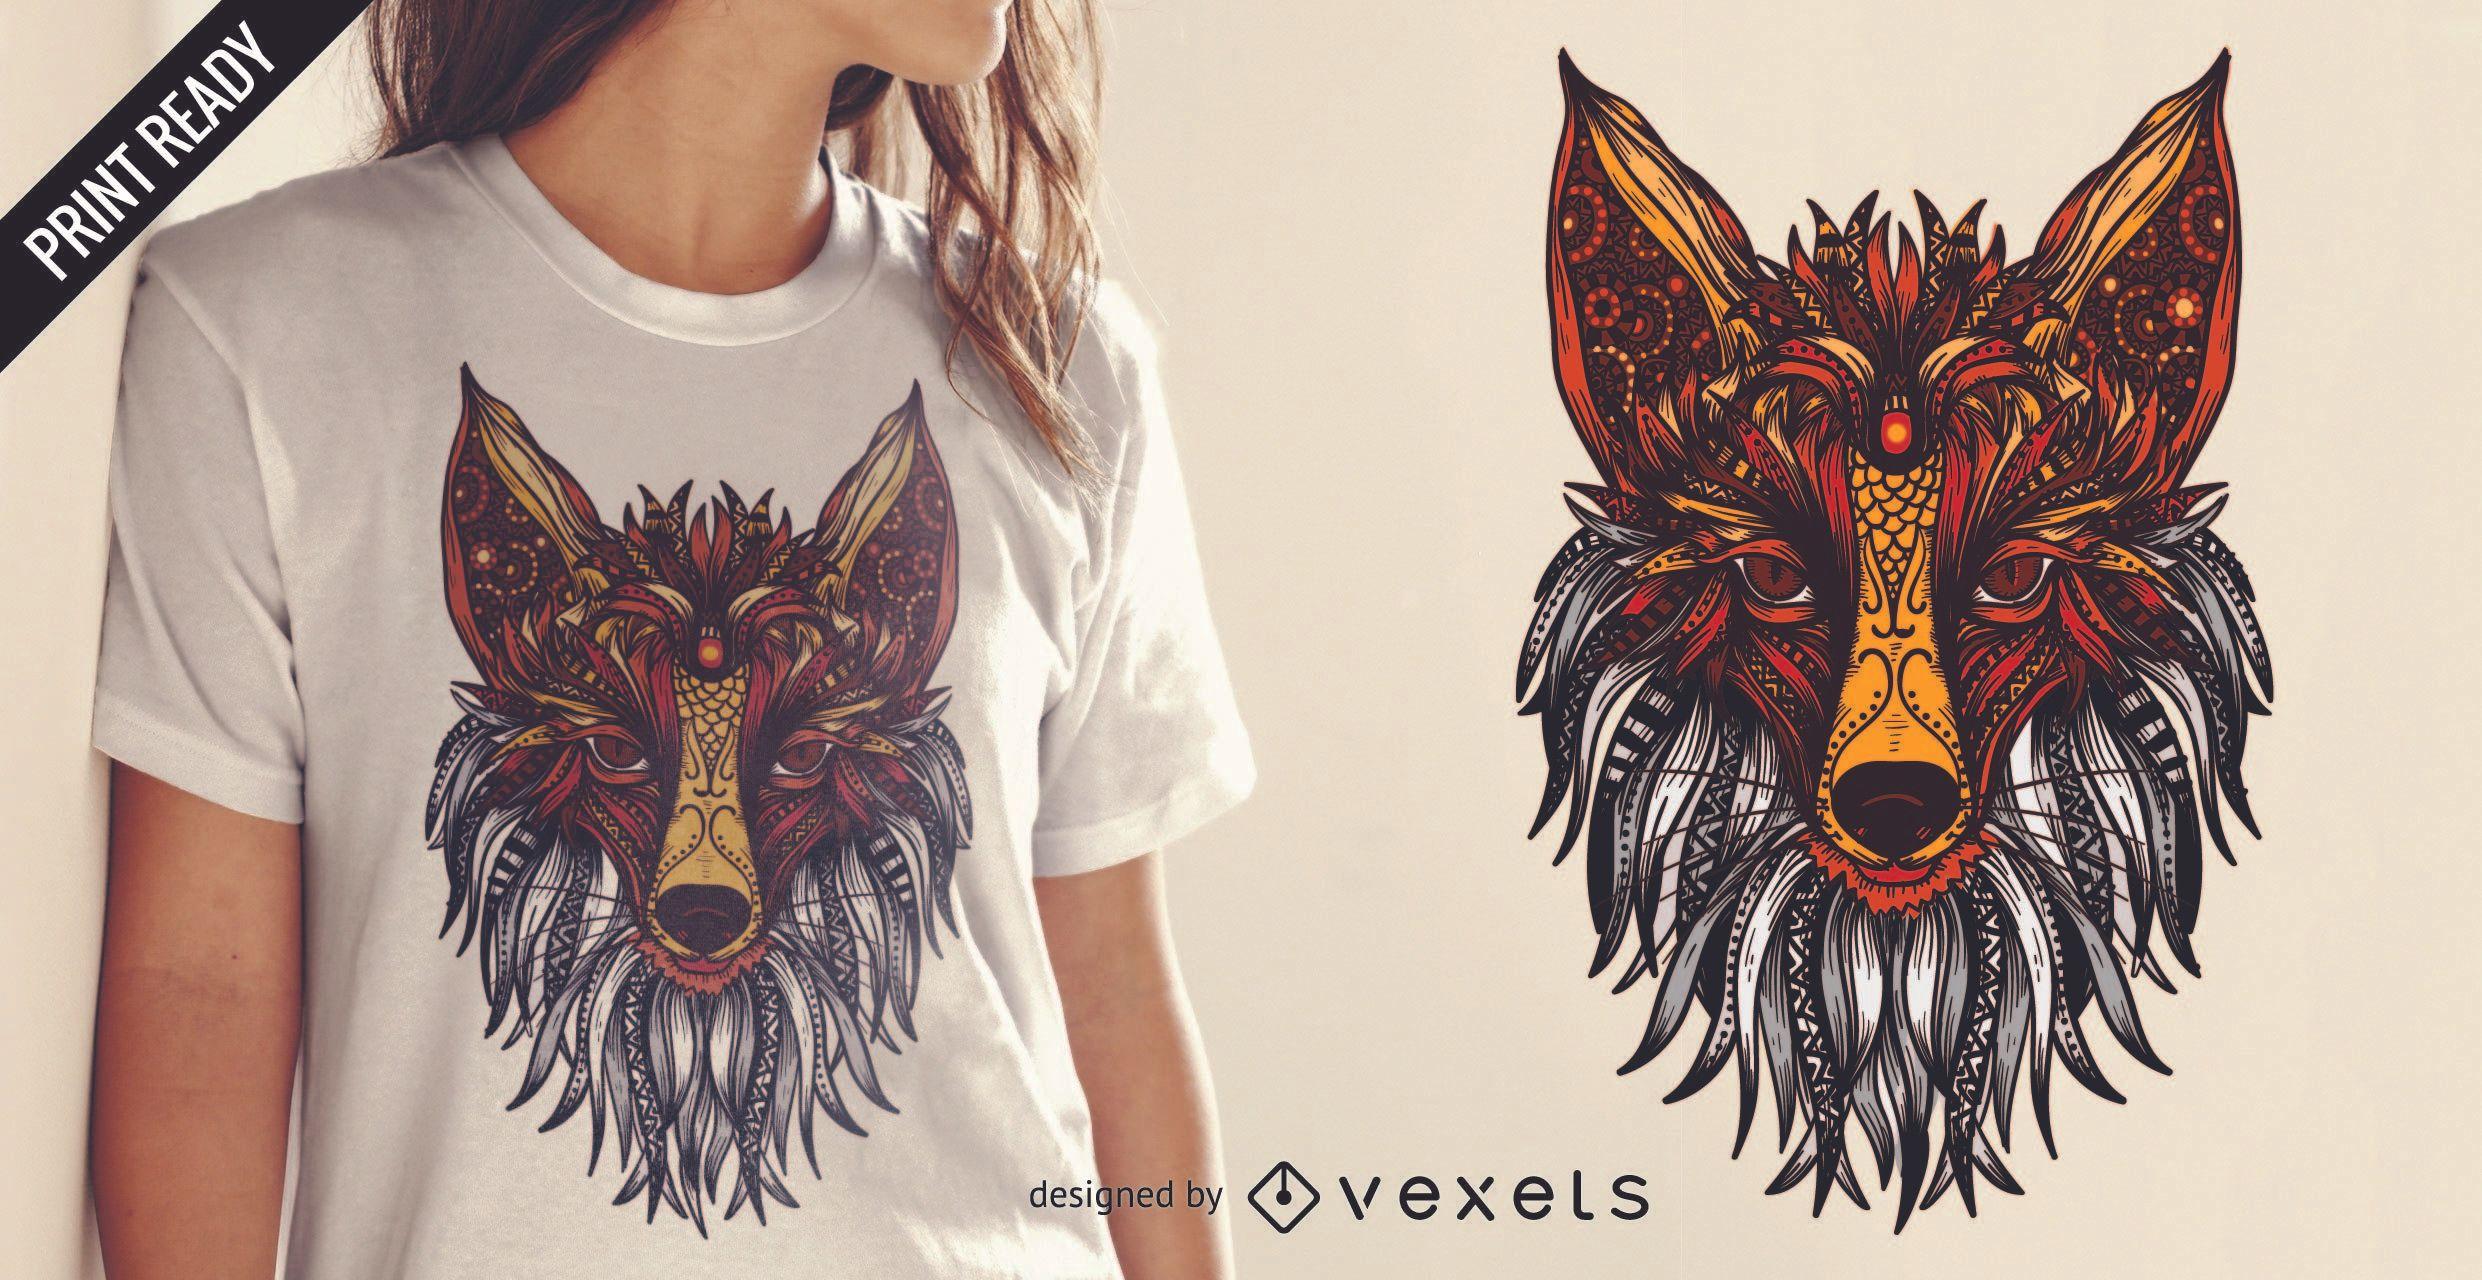 Mandala fox t-shirt design